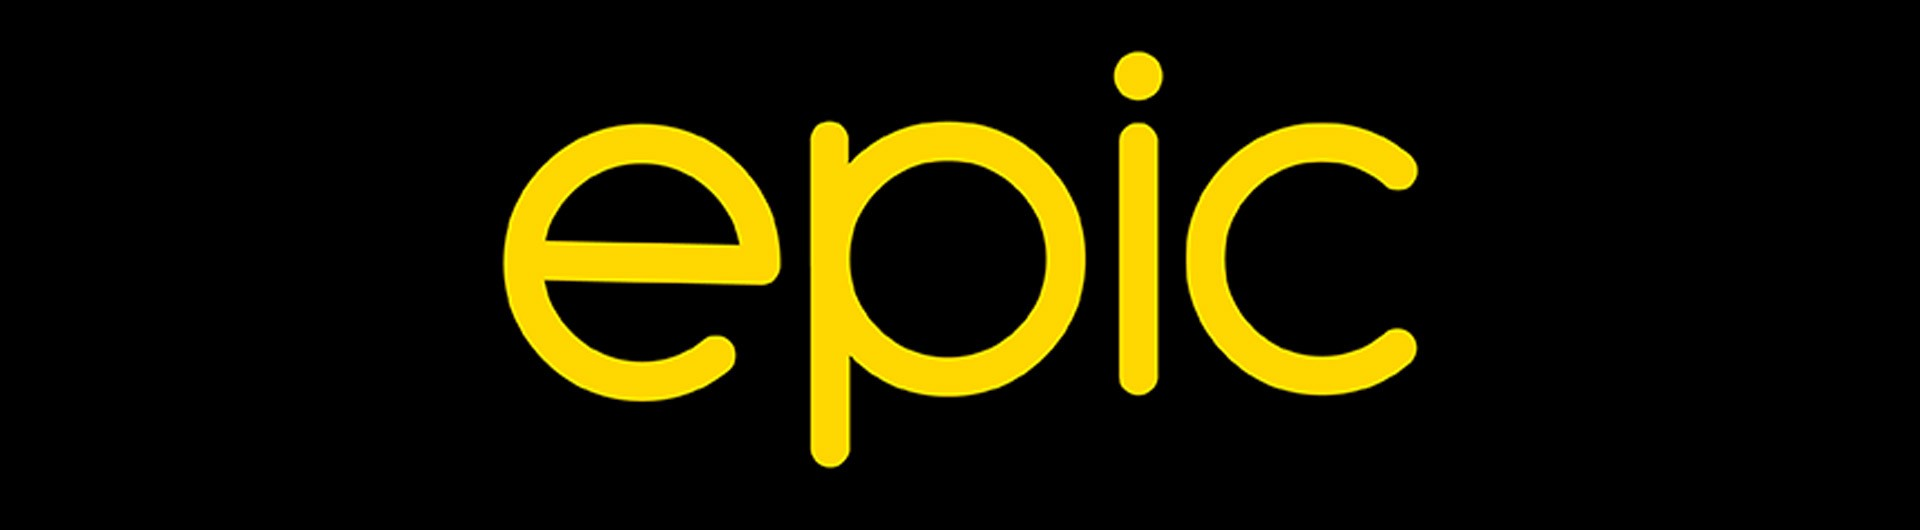 EPIC Data